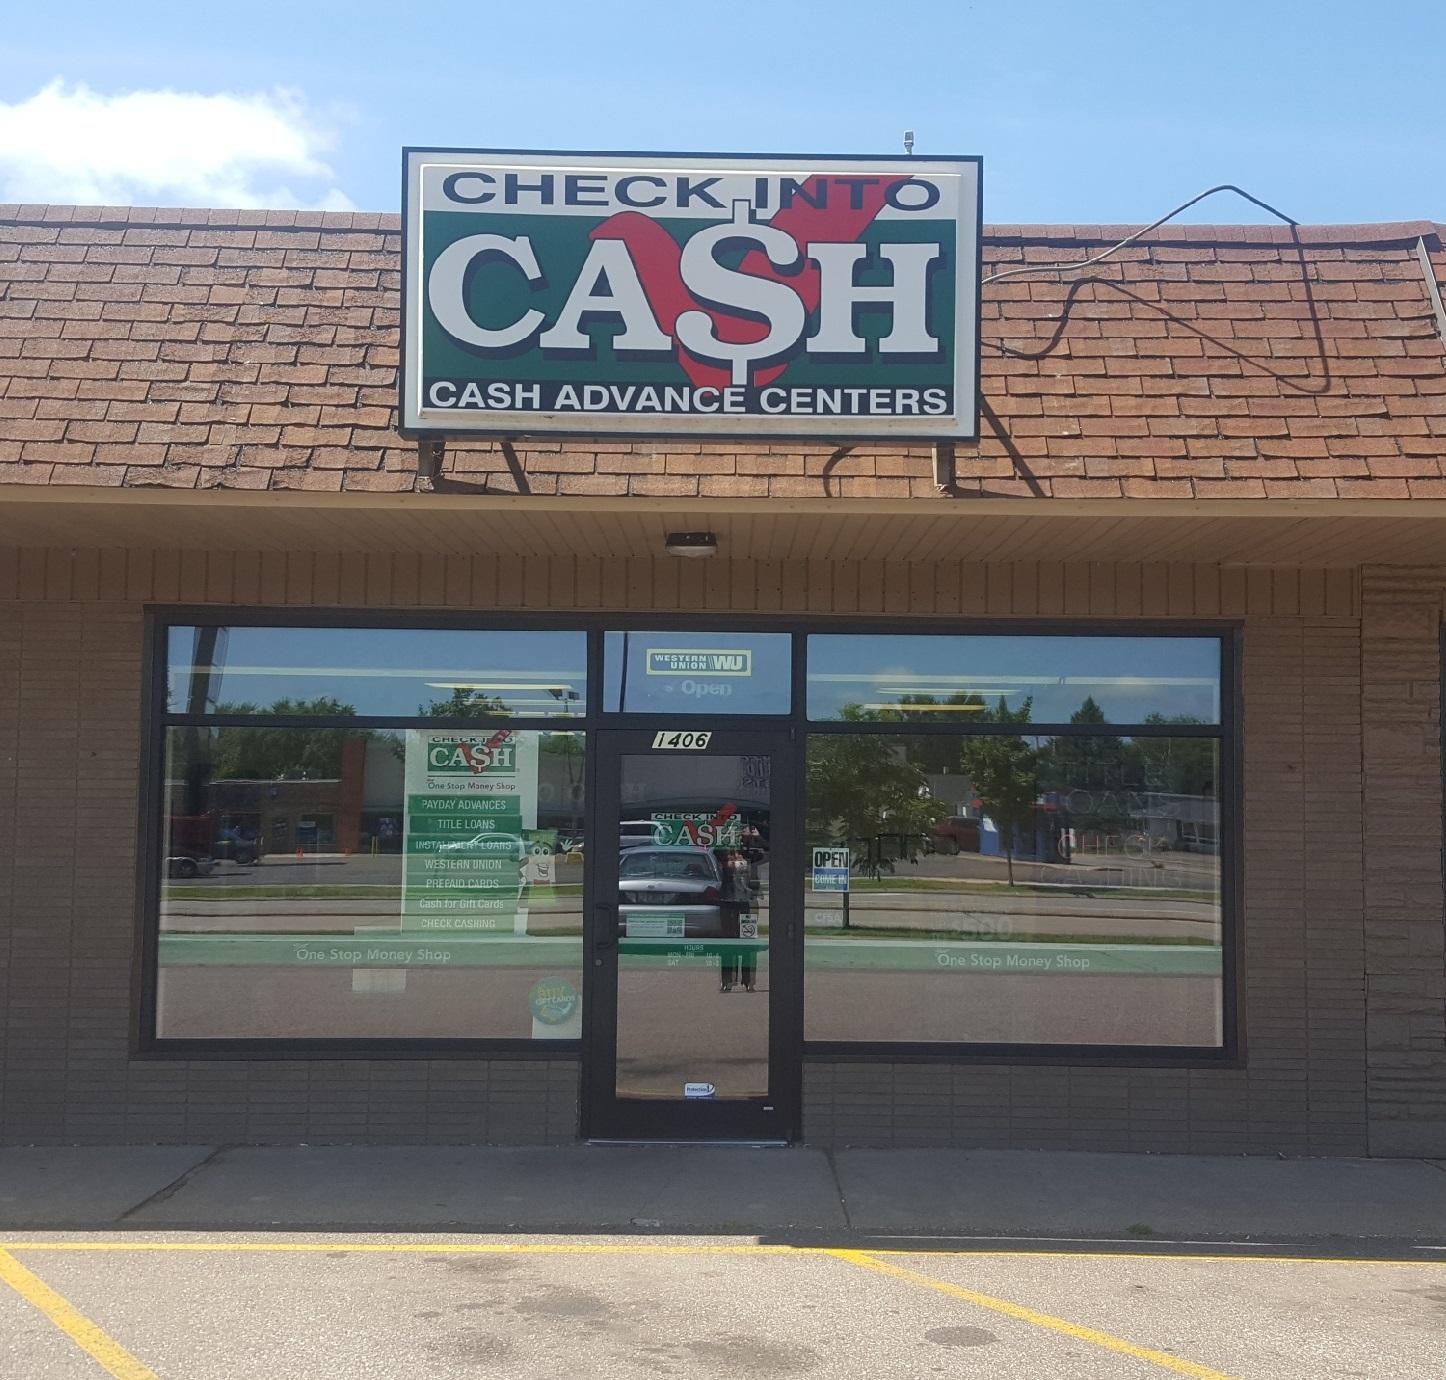 $715 Fast Payday Loans no Credit Check